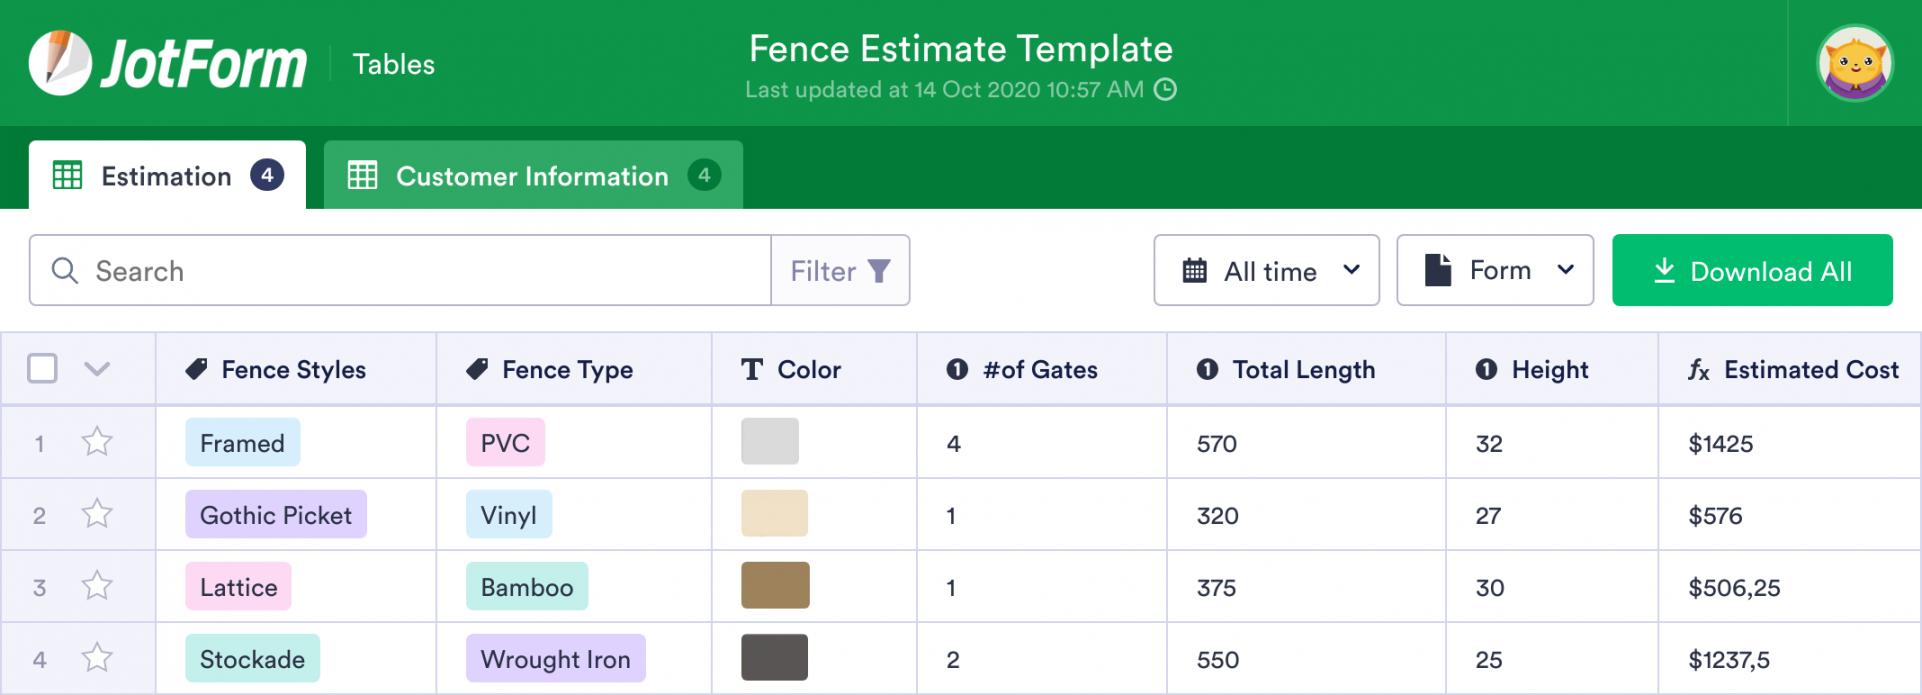 free fence estimate plantilla  jotform tables fence estimate template excel